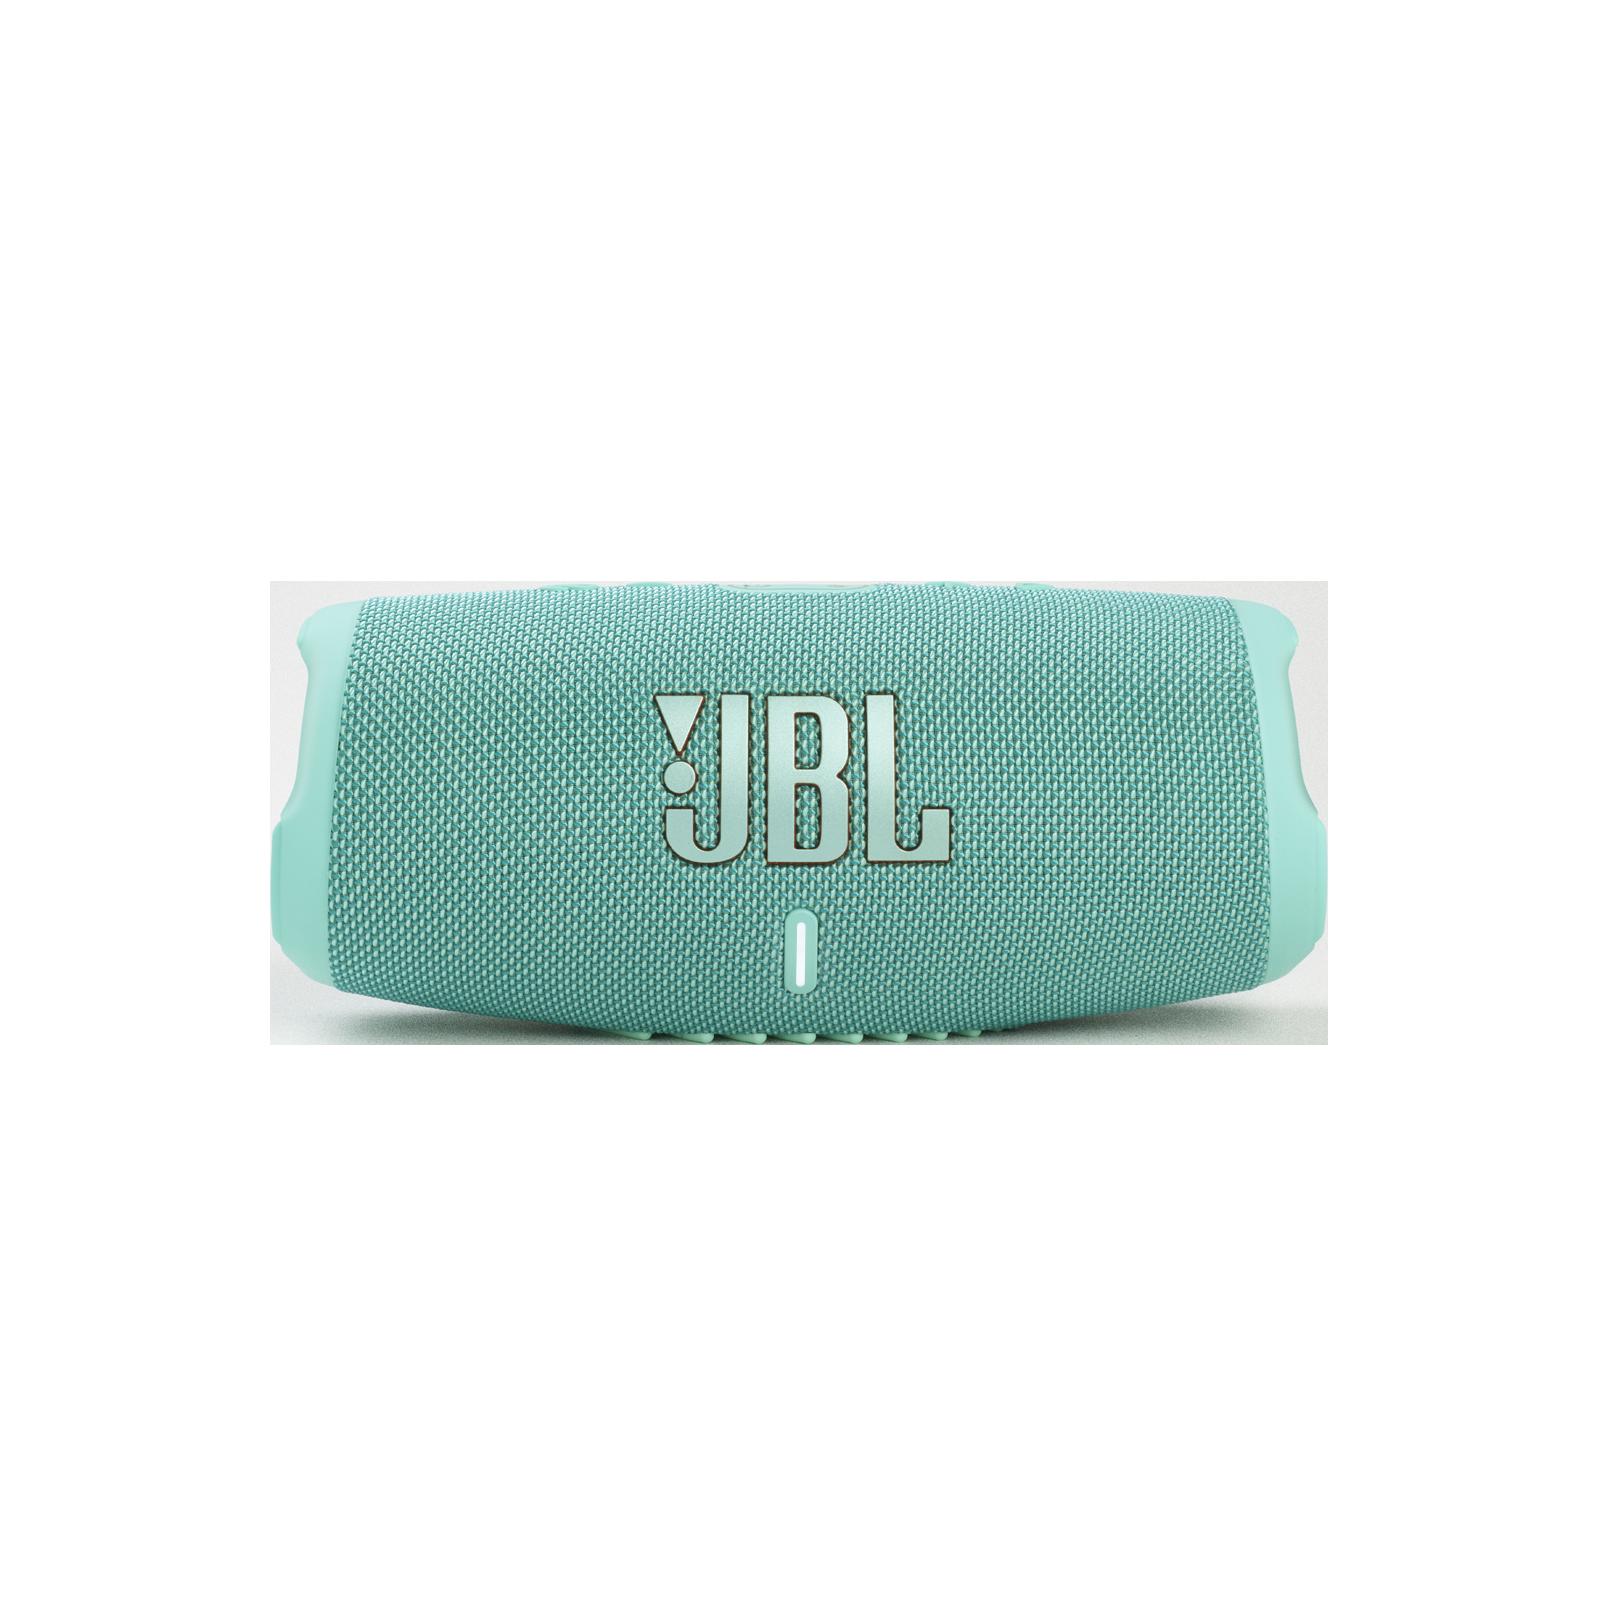 JBL CHARGE 5 - Teal - Portable Waterproof Speaker with Powerbank - Front